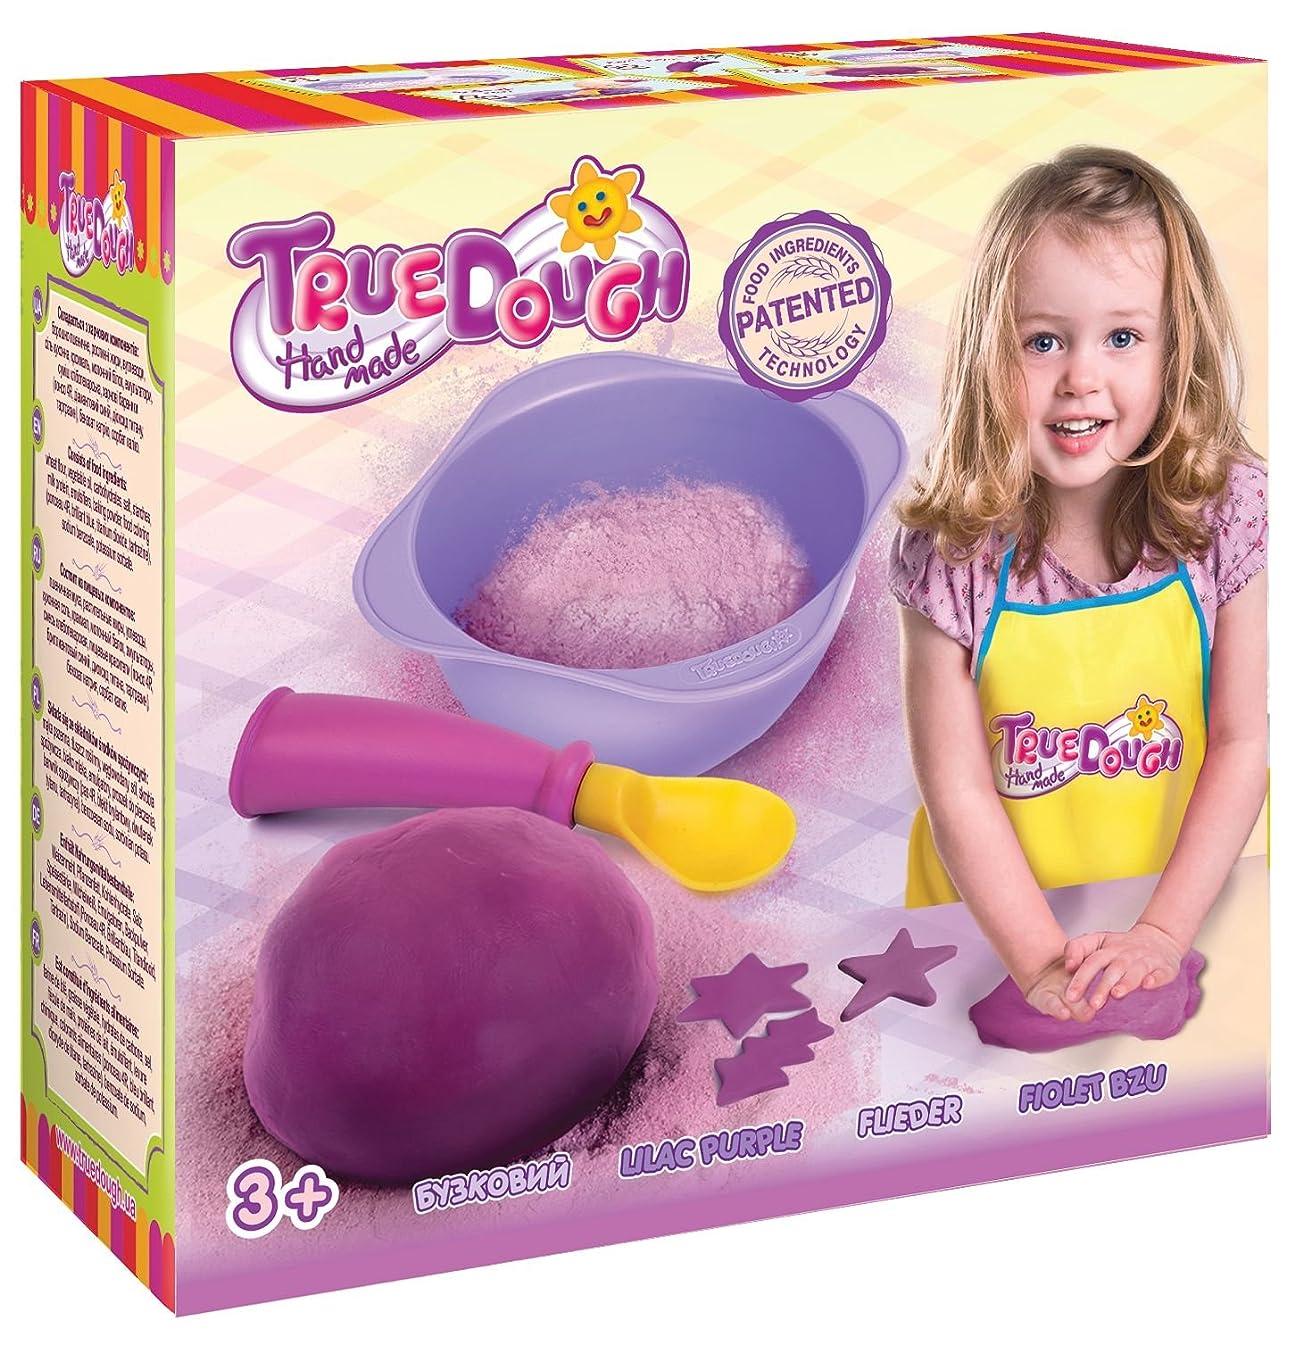 TrueDOUGH 21012 Make Your Own Modelling Dough Single Pack Set, Lilac Purple